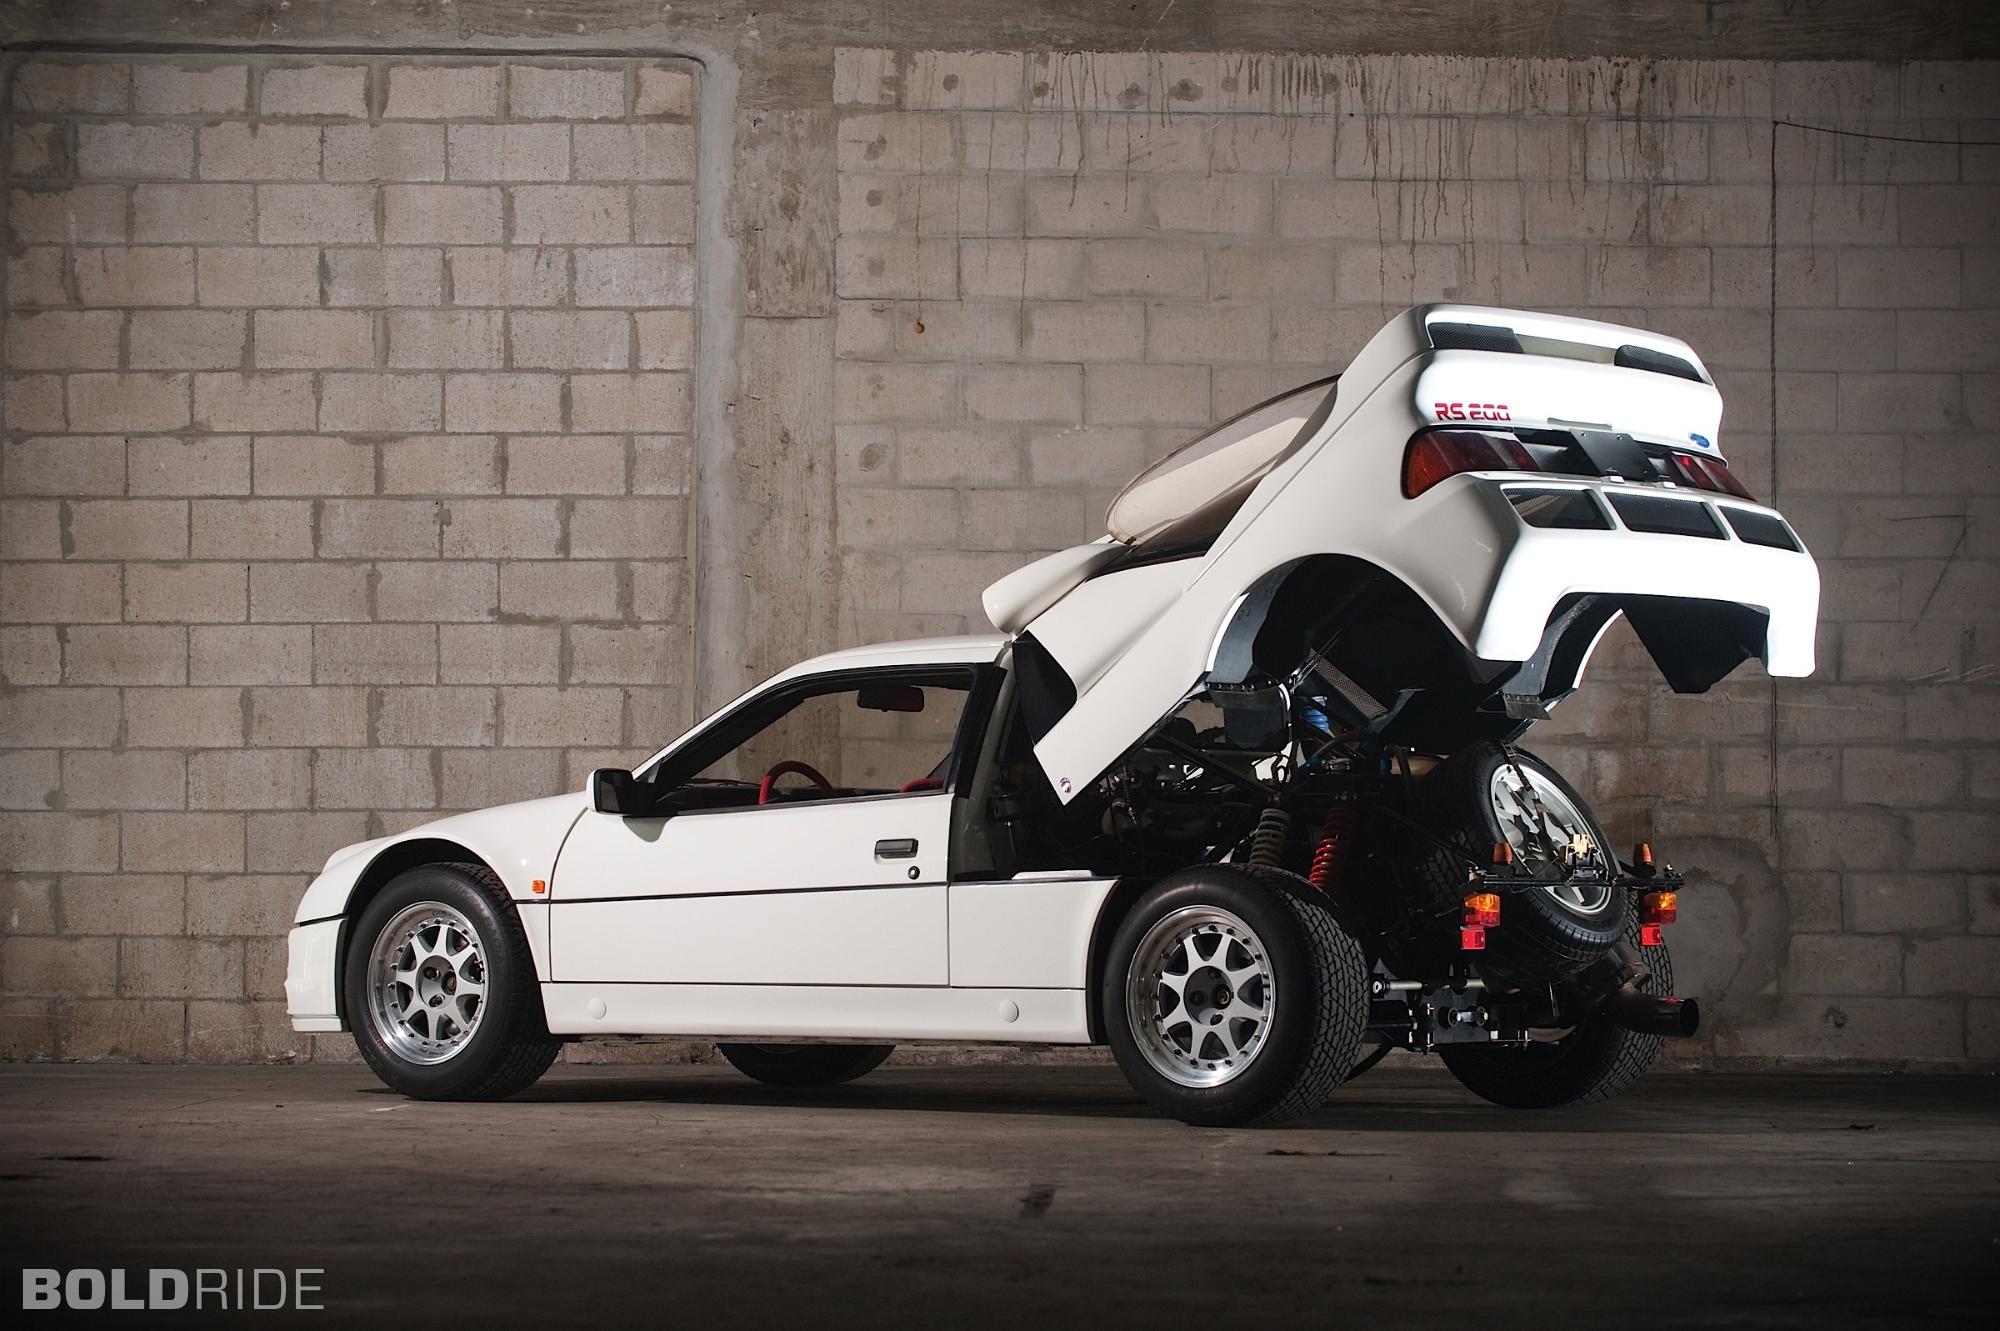 ford-rs200-evolution.2000x1331.Jan-04-2012_21.28.34.206026.jpg